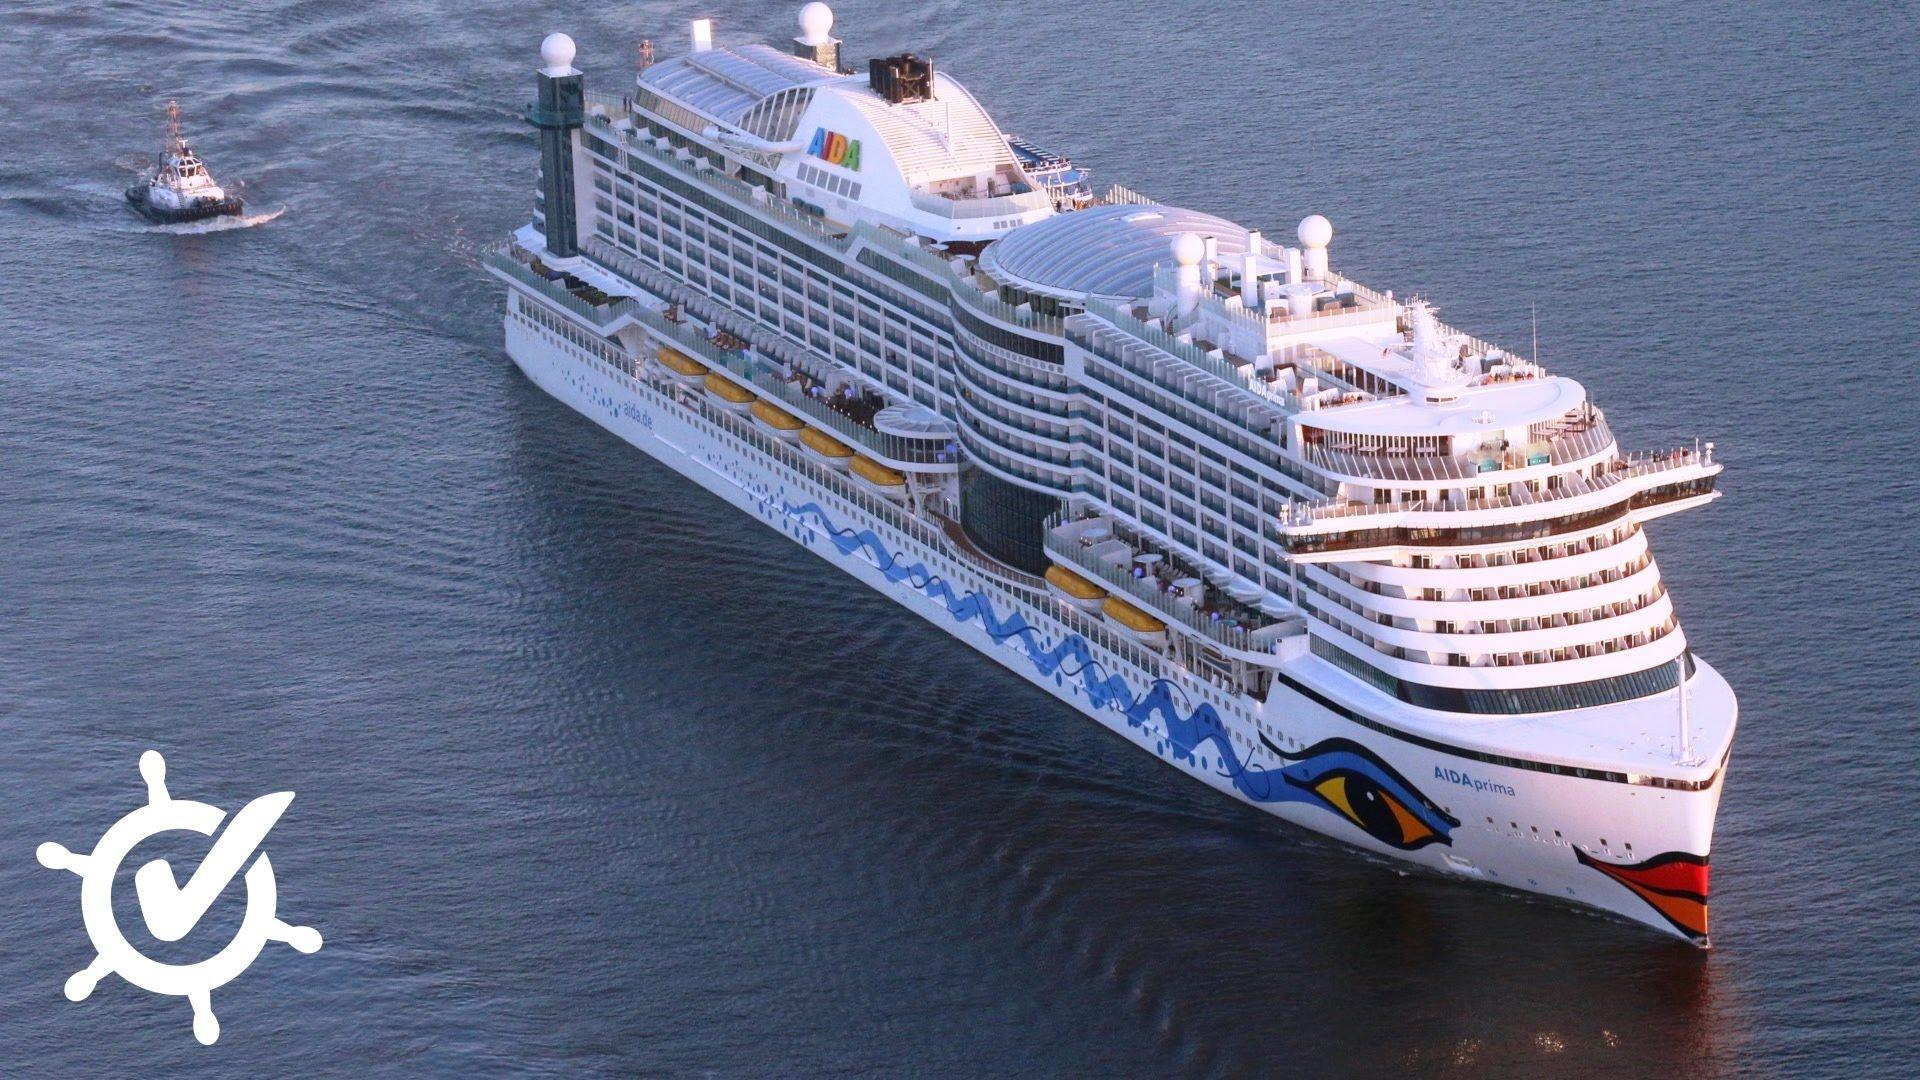 AIDAprima: Live-Rundgang | Cruise reviews, Cruise, Southampton